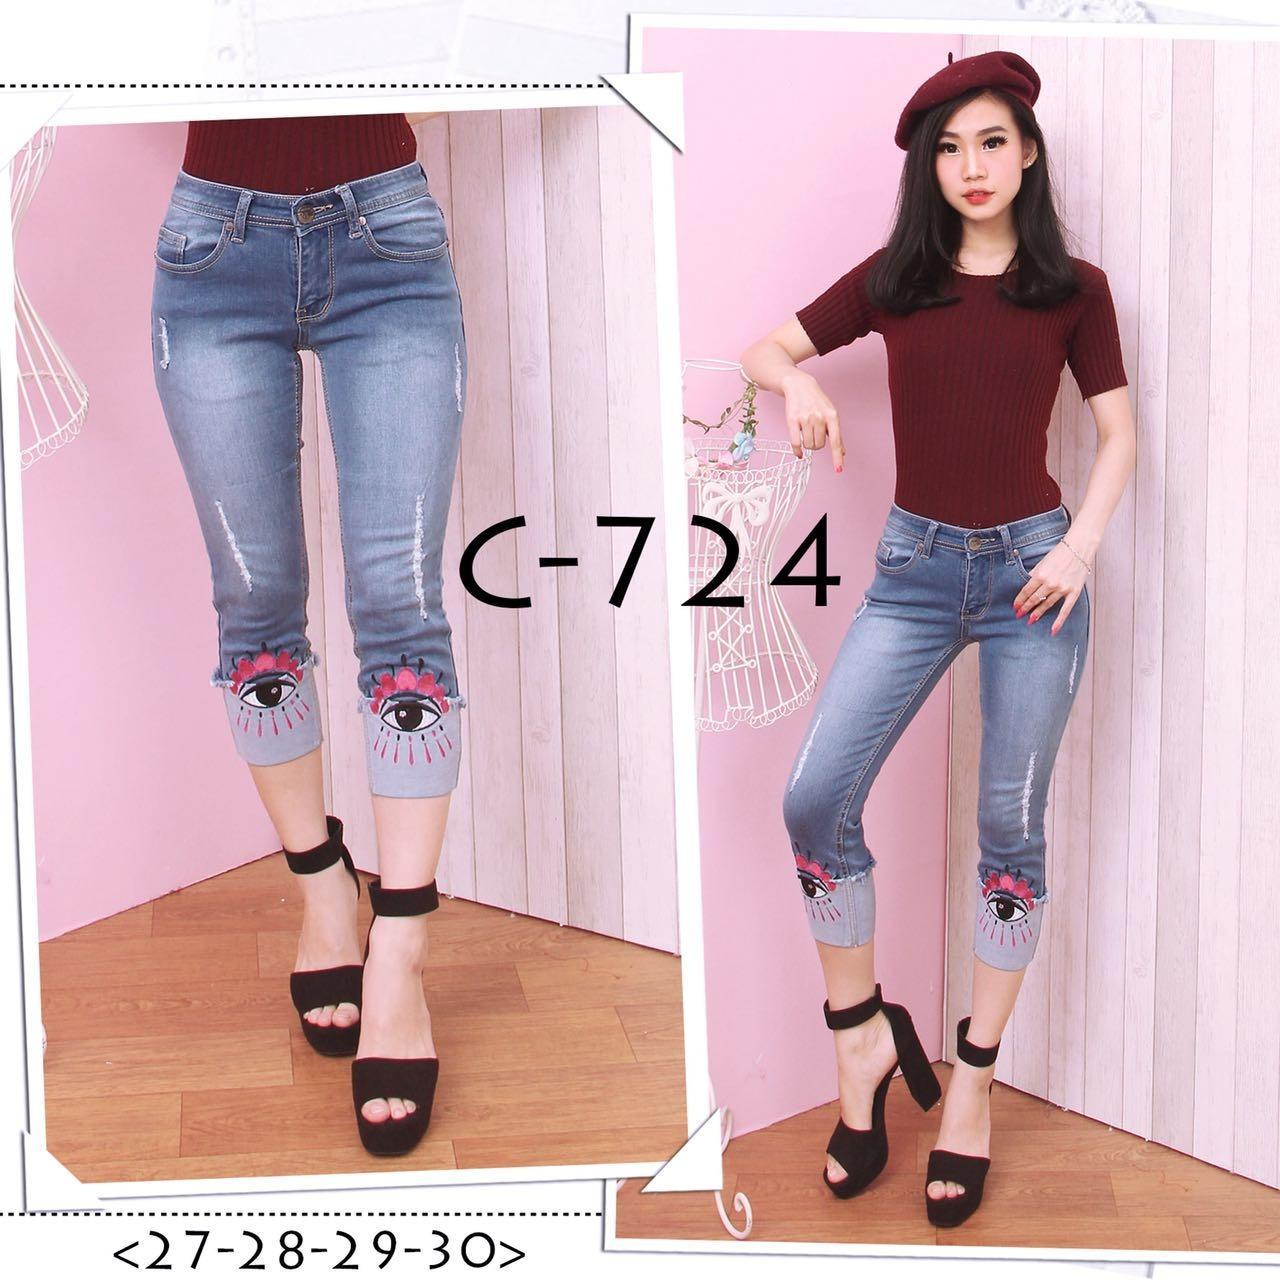 Ulasan Mengenai Jhf Celana Jeans Ripped Wanita 7 8 Stik Balik Motif Kucing Dan Mata